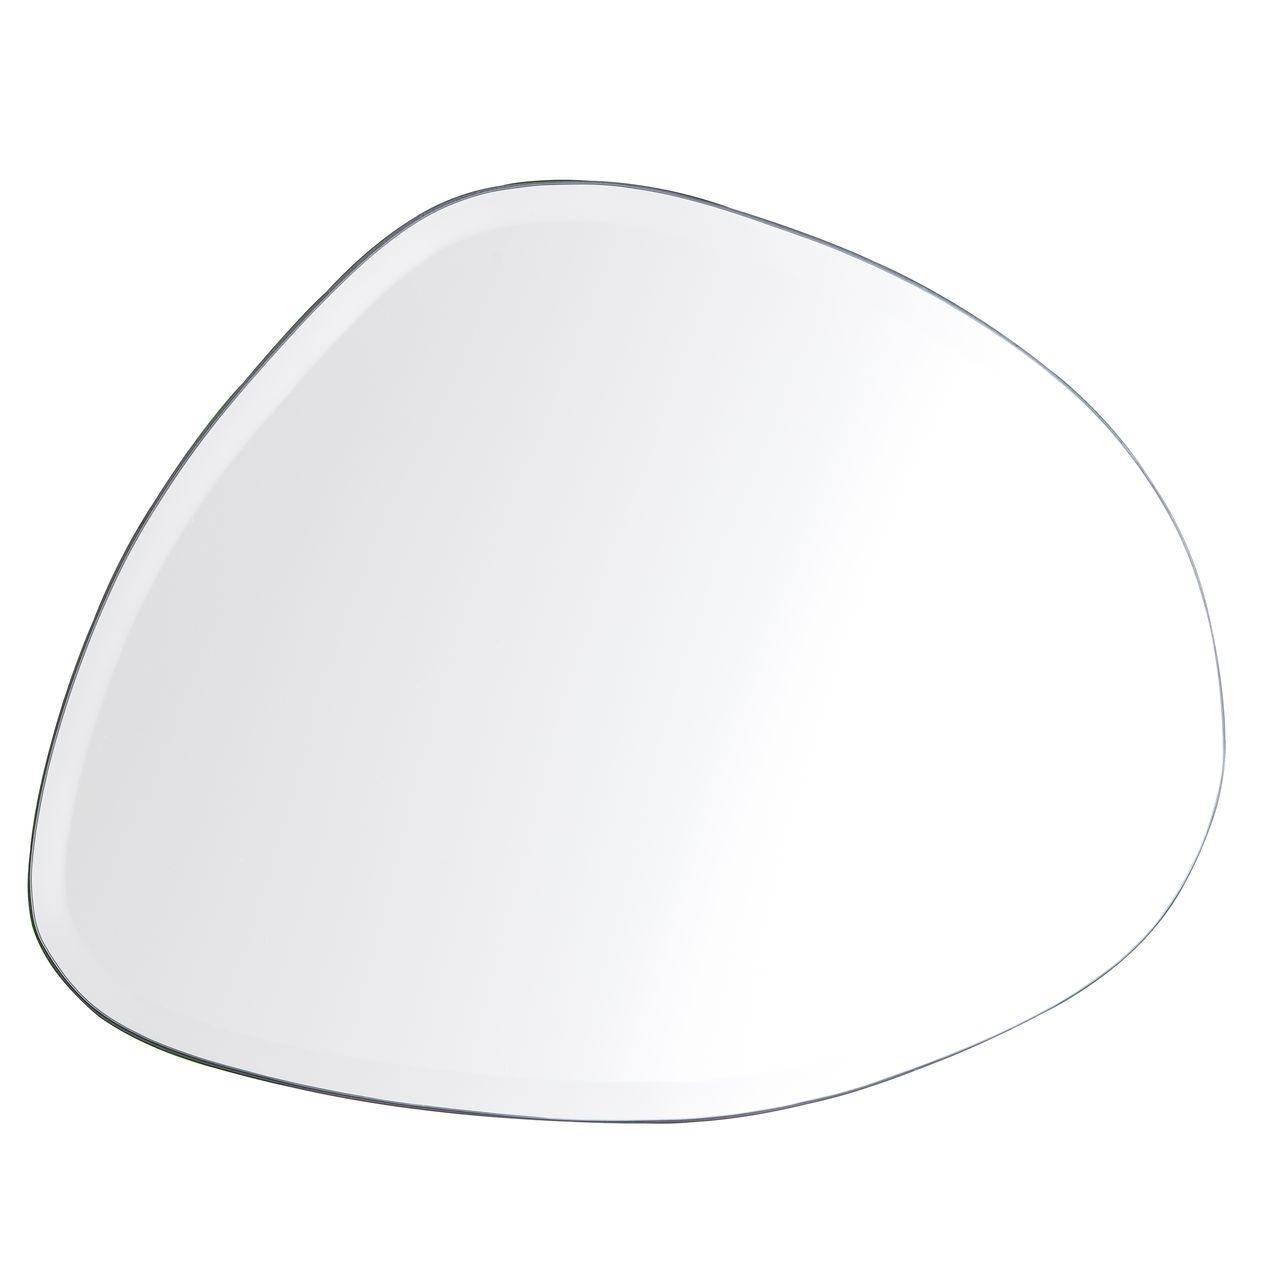 Holly & Martin Woxsley 5-Piece Decorative Mirror Set in Mirror